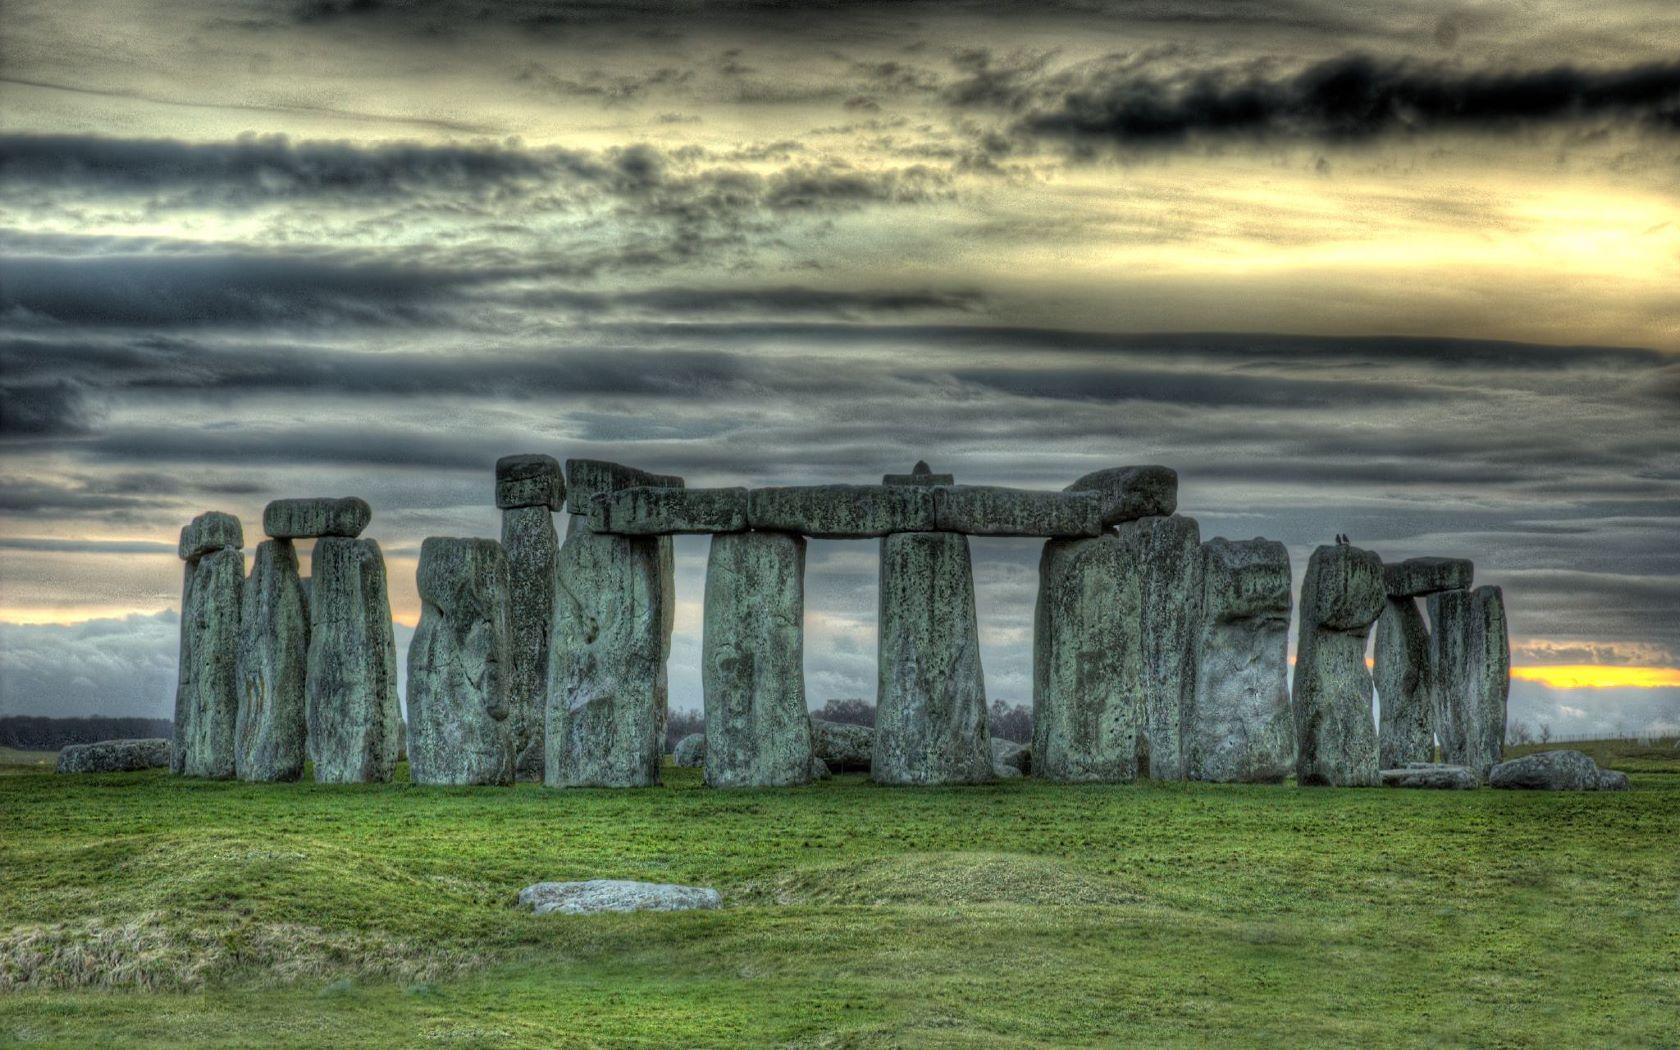 Famous Rock Group, Stonehenge, Wiltshire, England  № 715559 загрузить